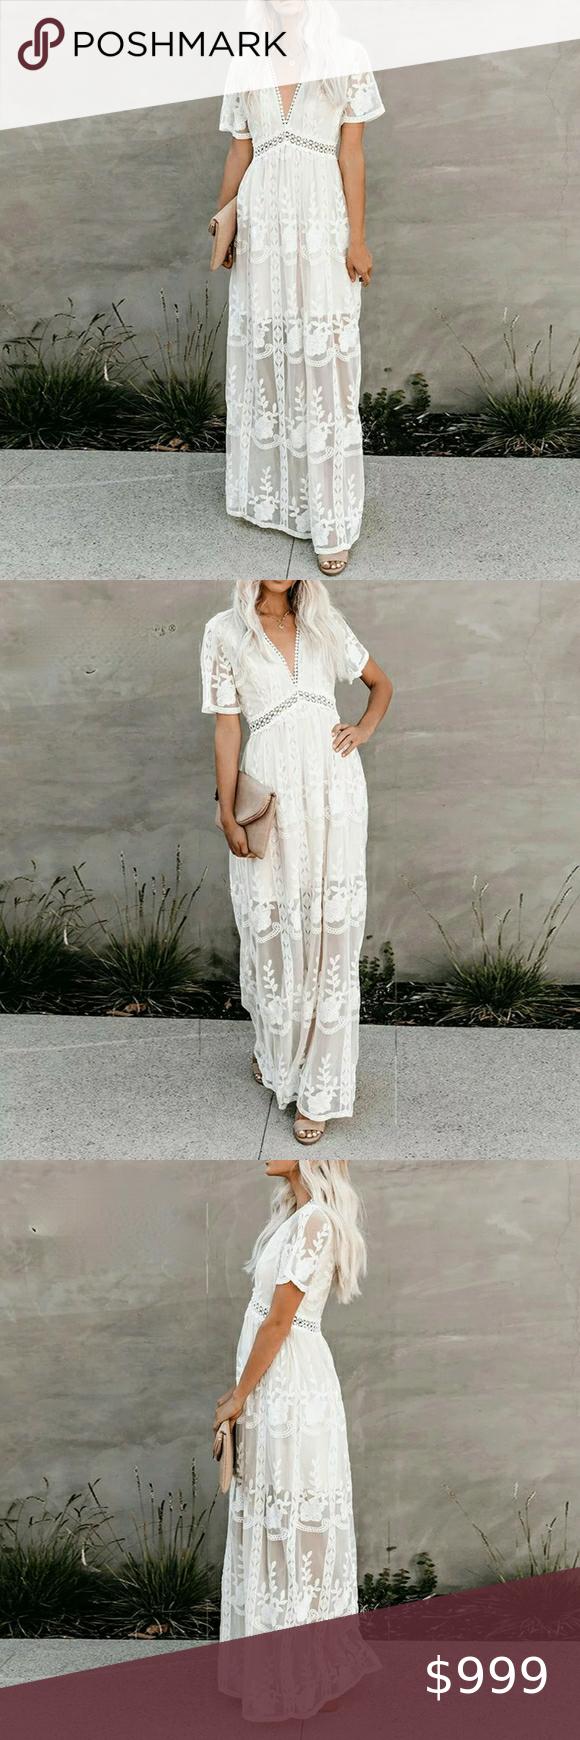 Nwt Gorgeous Lace Overlay Boho Maxi Dress Small Boho Maxi Dress White Lace Boho Maxi Dress White Lace Dress Boho [ 1740 x 580 Pixel ]